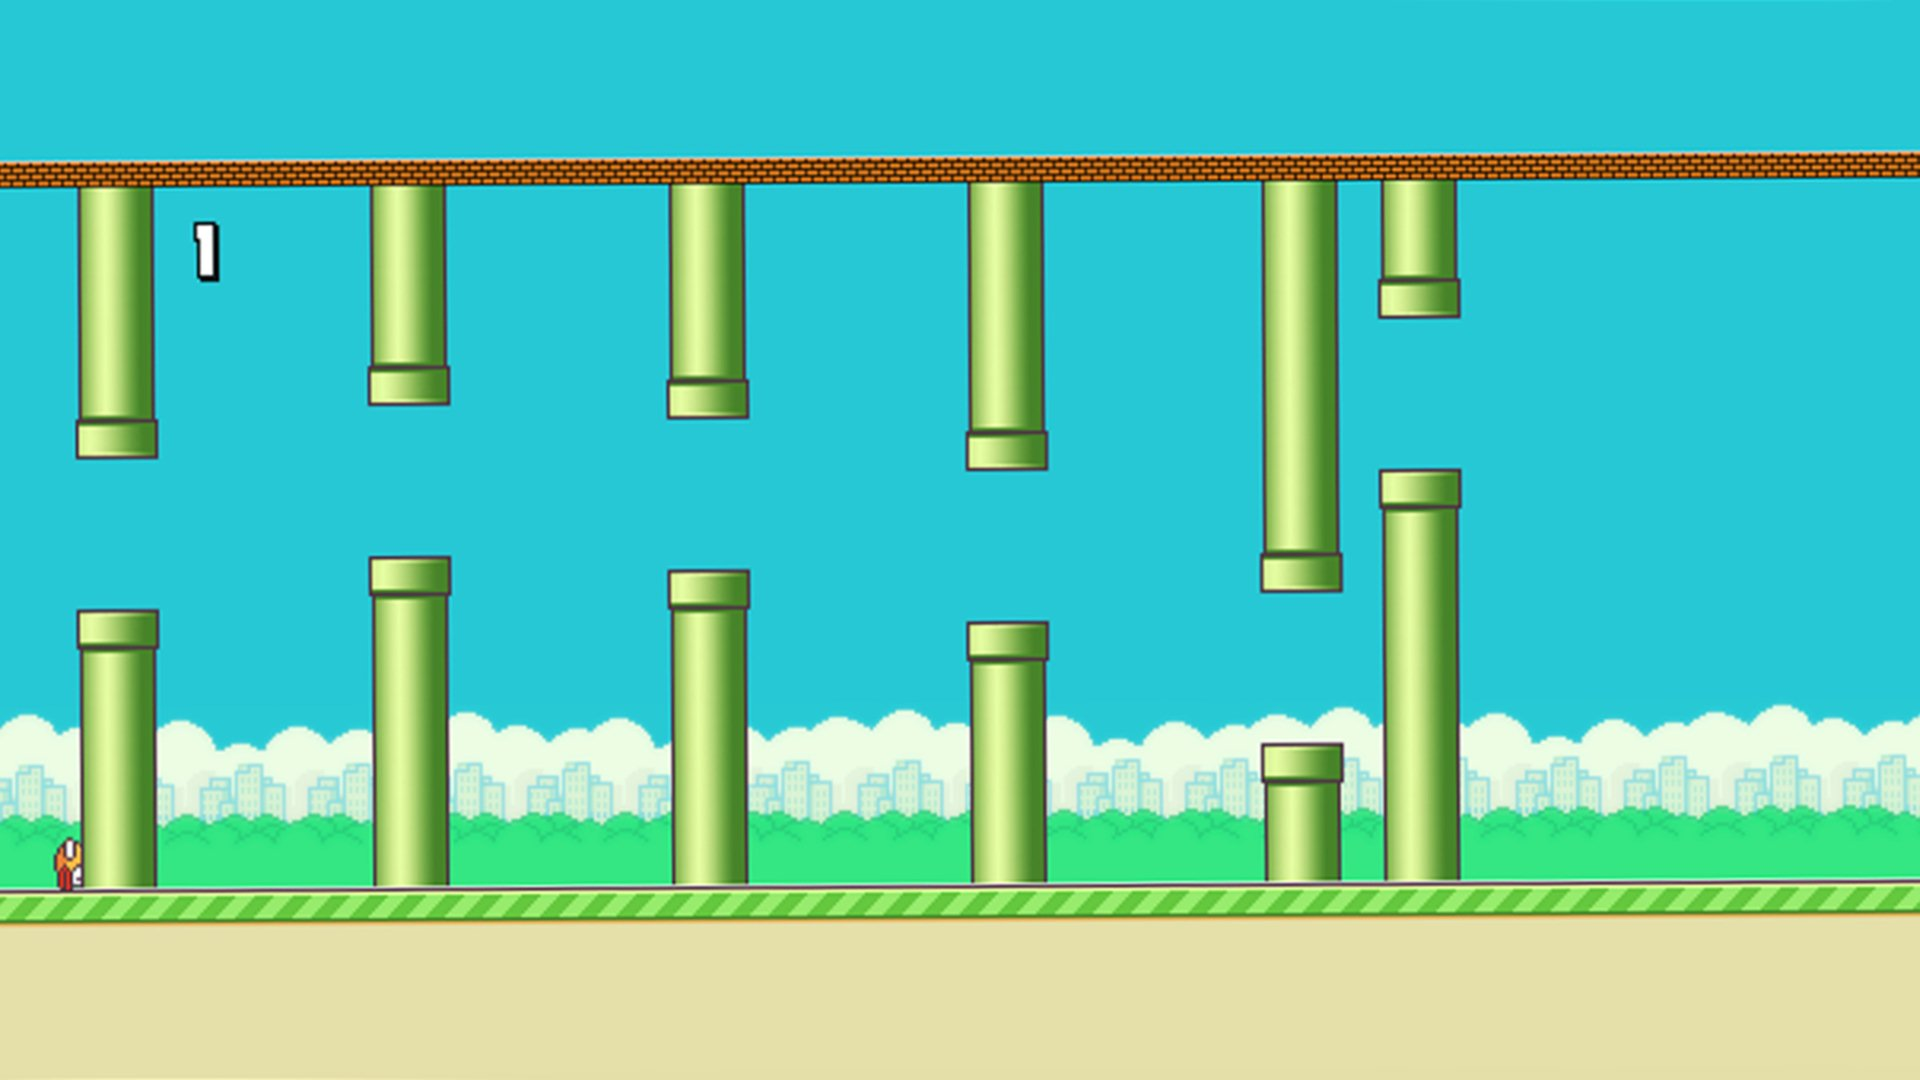 5 HD Flappy Bird Game Wallpapers - HDWallSource com